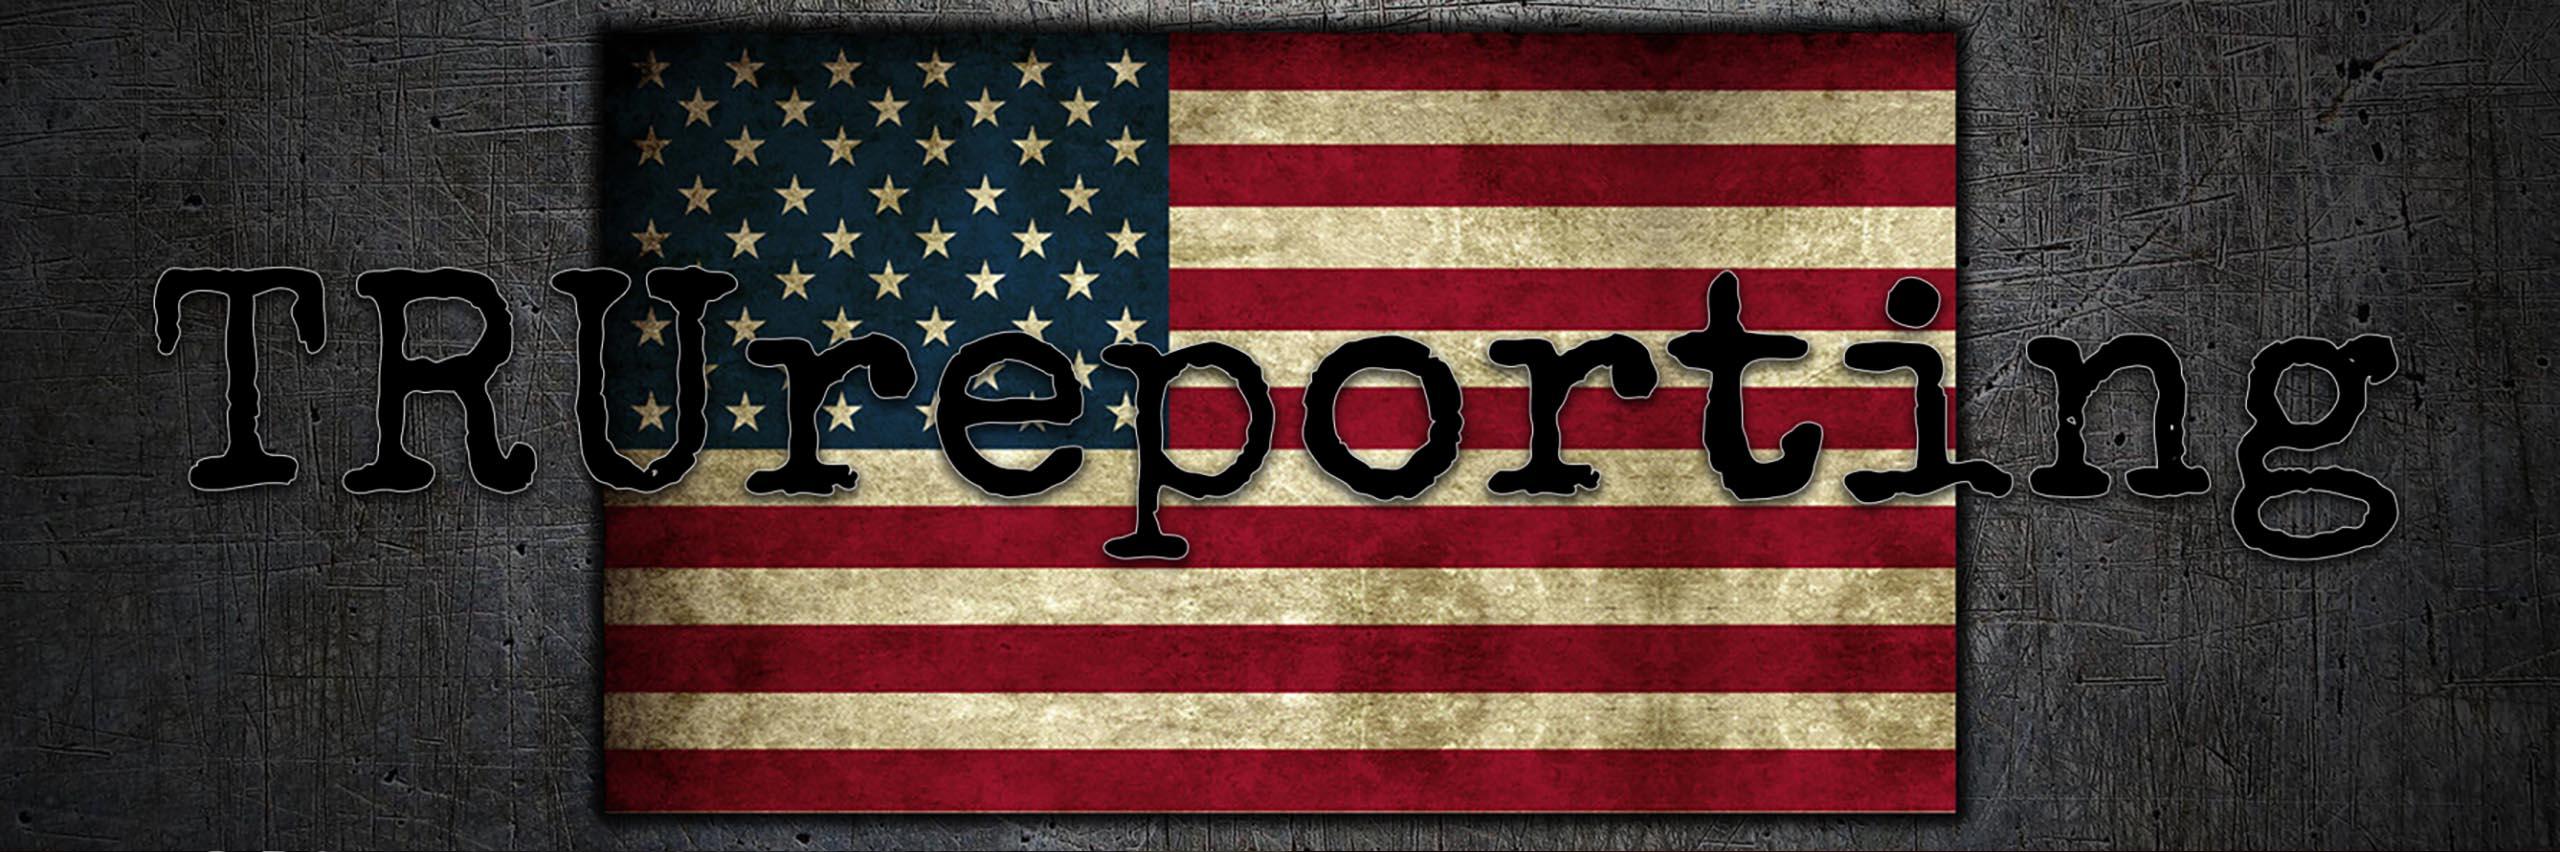 TRUreporting_header2